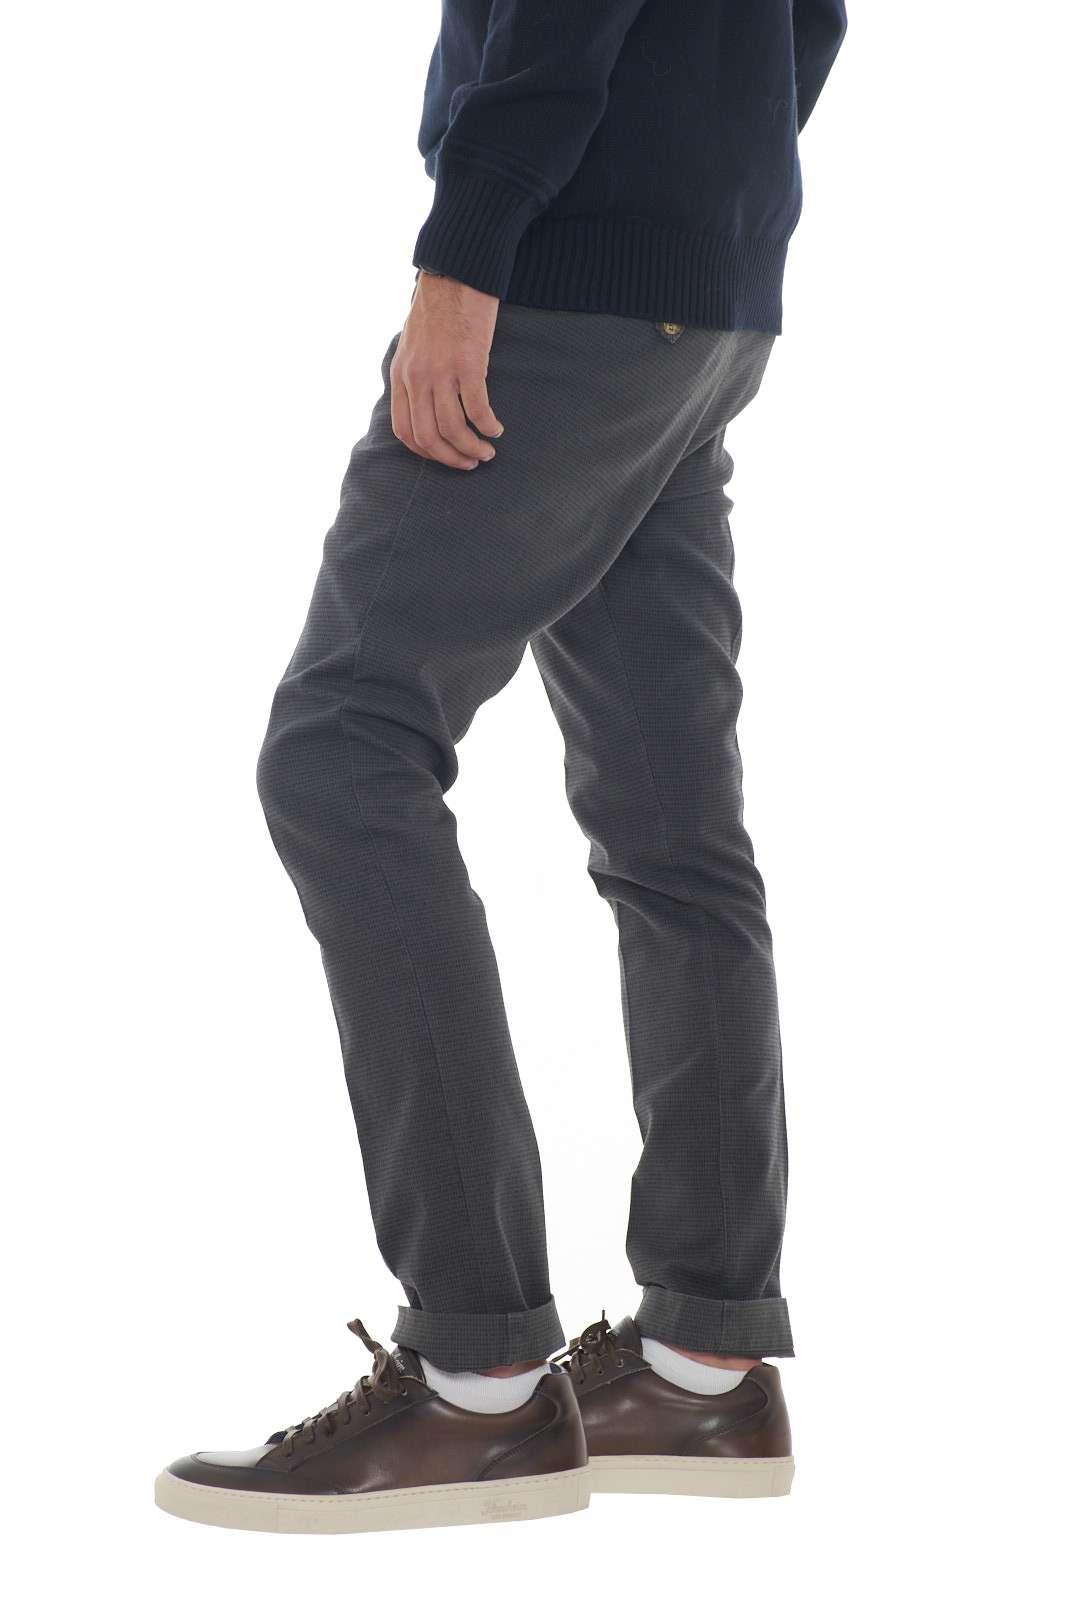 https://www.parmax.com/media/catalog/product/a/i/AI-outlet_parmax-pantaloni-uomo-Entre-Amis-A208358%201788-B.jpg